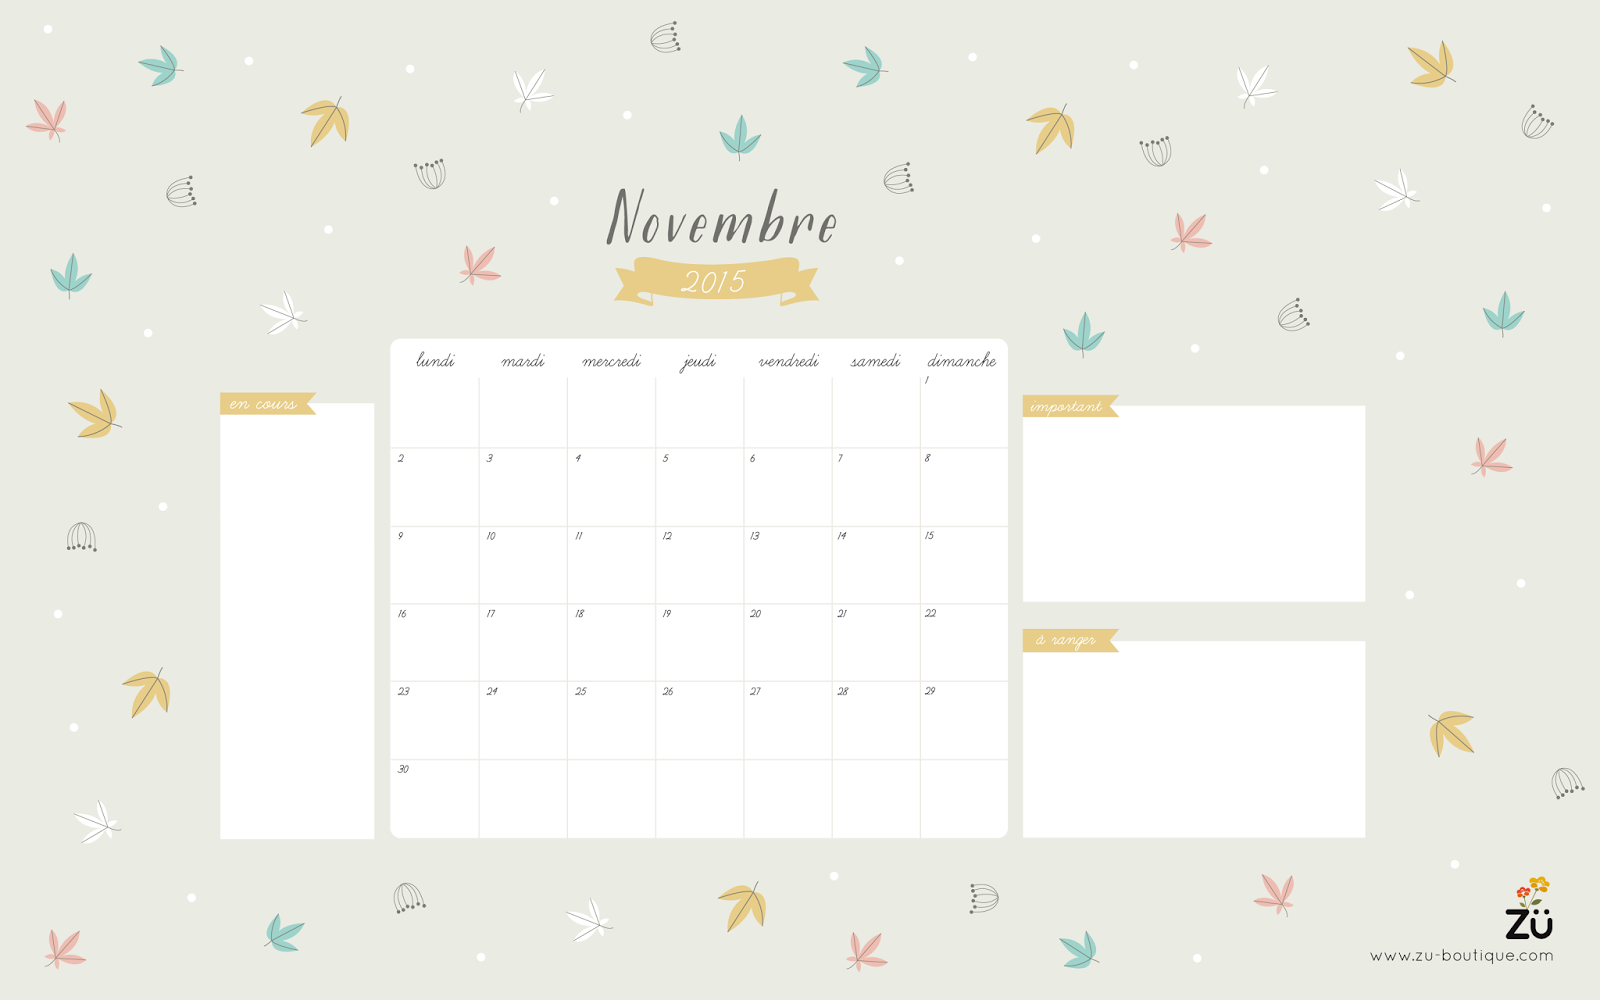 Calendrier diy novembre 2015 z le blog for Fond ecran novembre